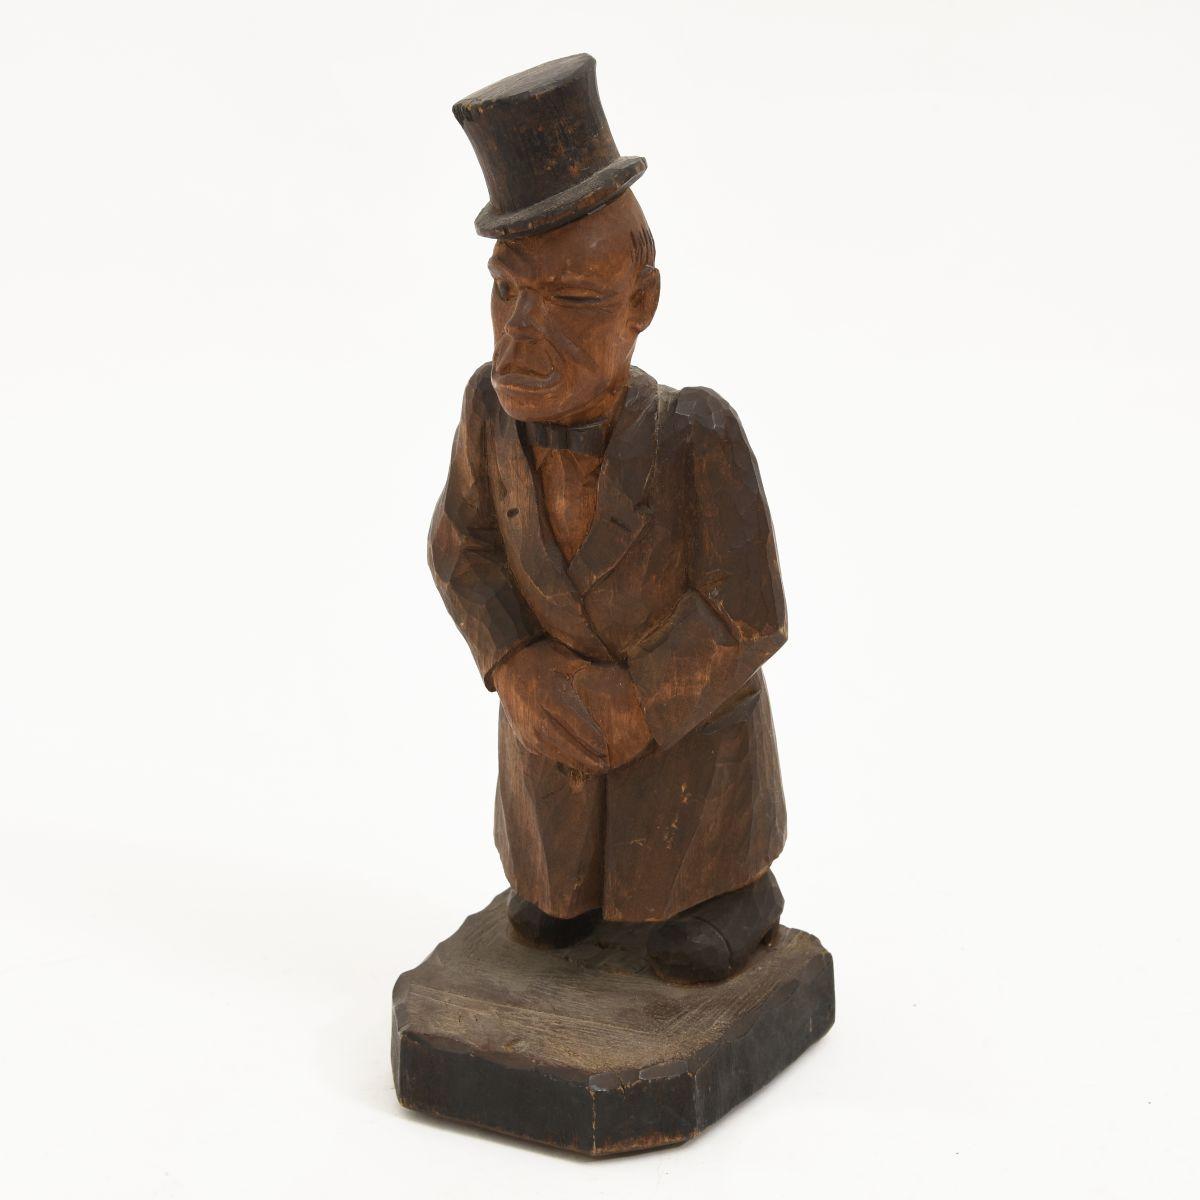 Talvi-U-Woodedn-Sculpture-Gentle-Men